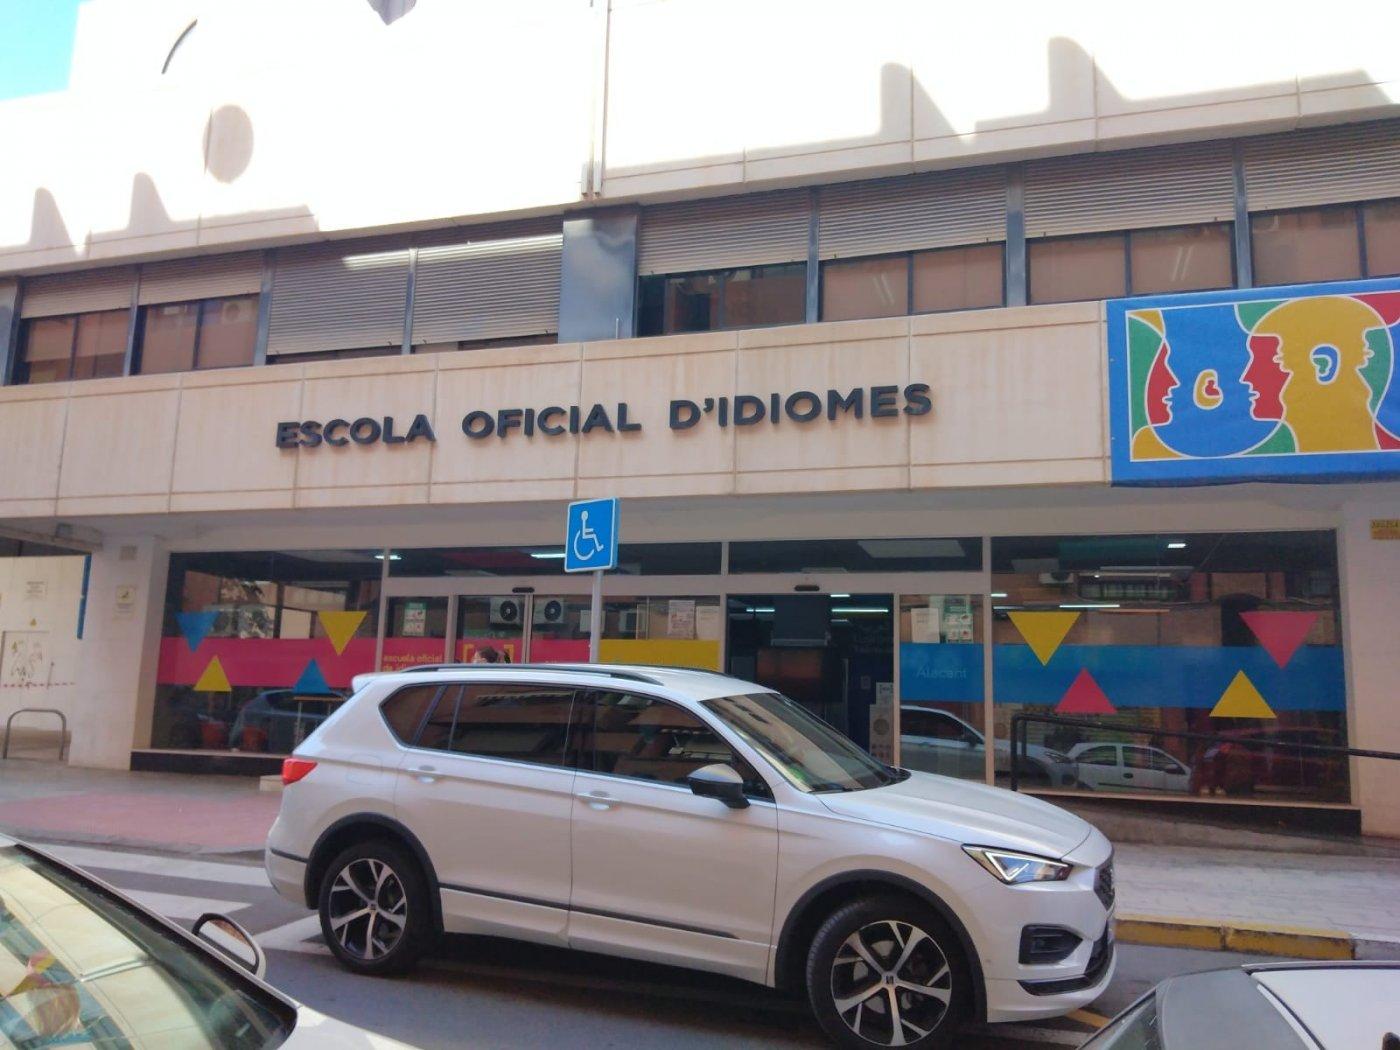 Local comercial frente a escuela oficial de idiomas - imagenInmueble0